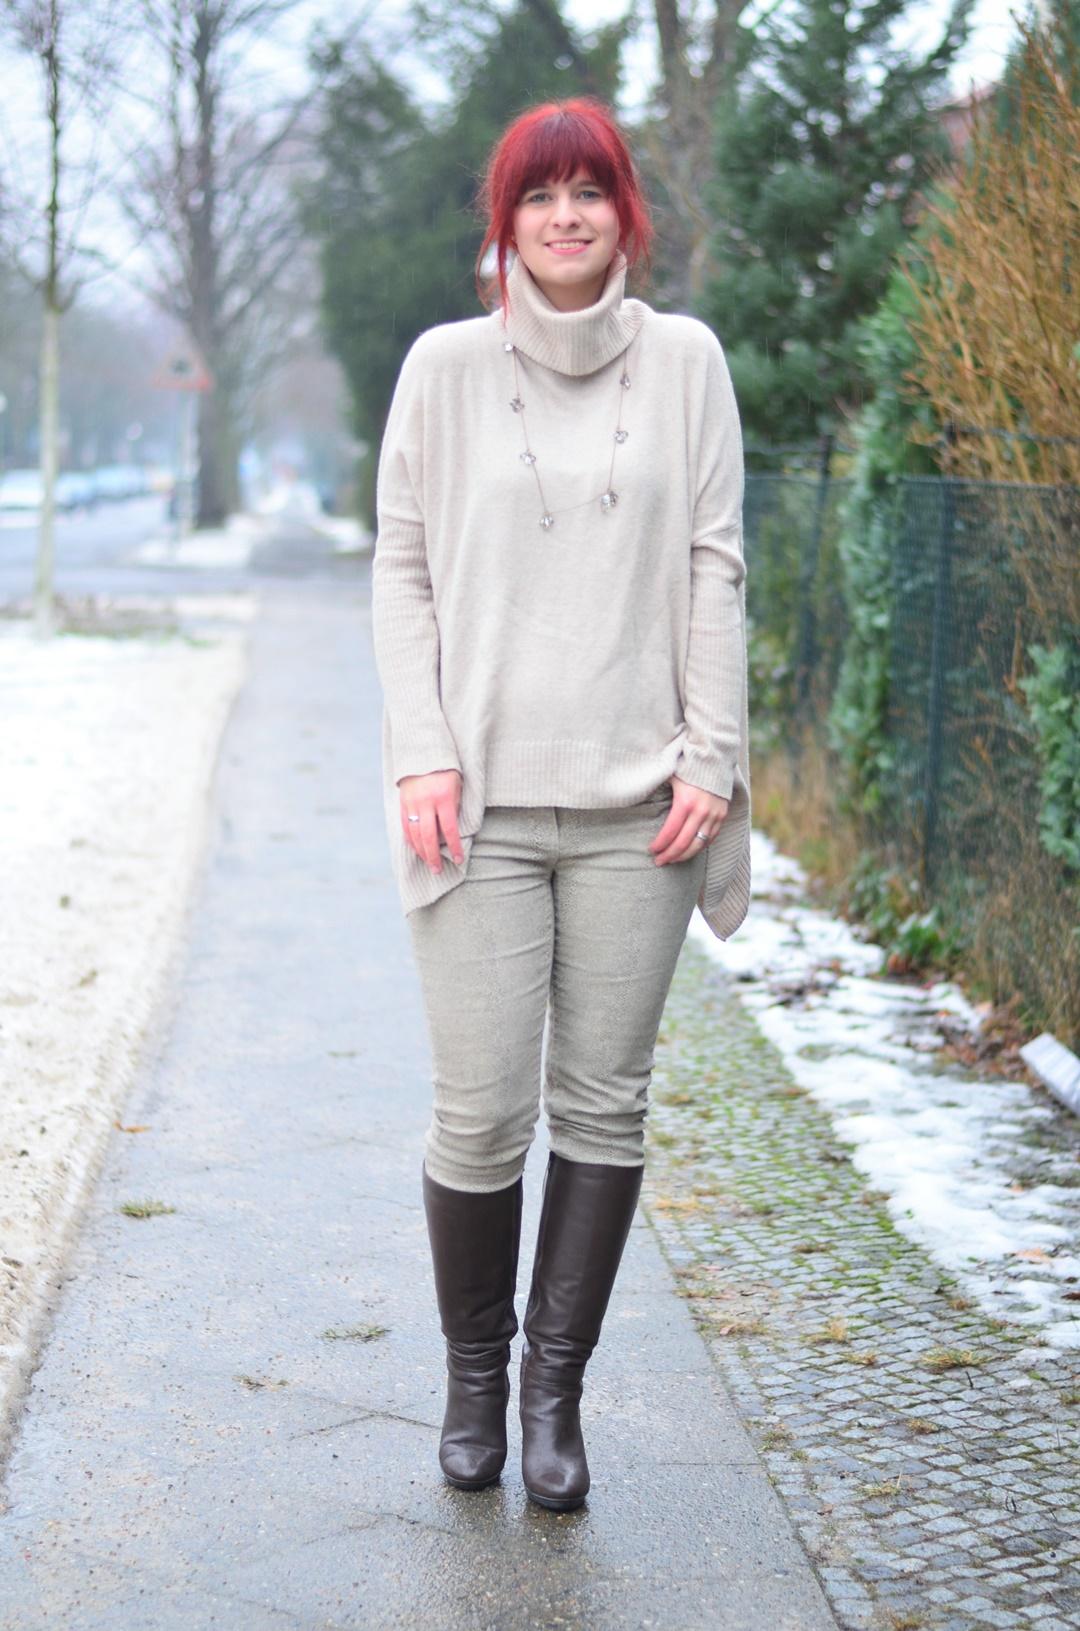 outfitpost_fashionblog_annanikabu_fashion_herbstoutfit_braune-stiefel_poncho_braunschweig-1